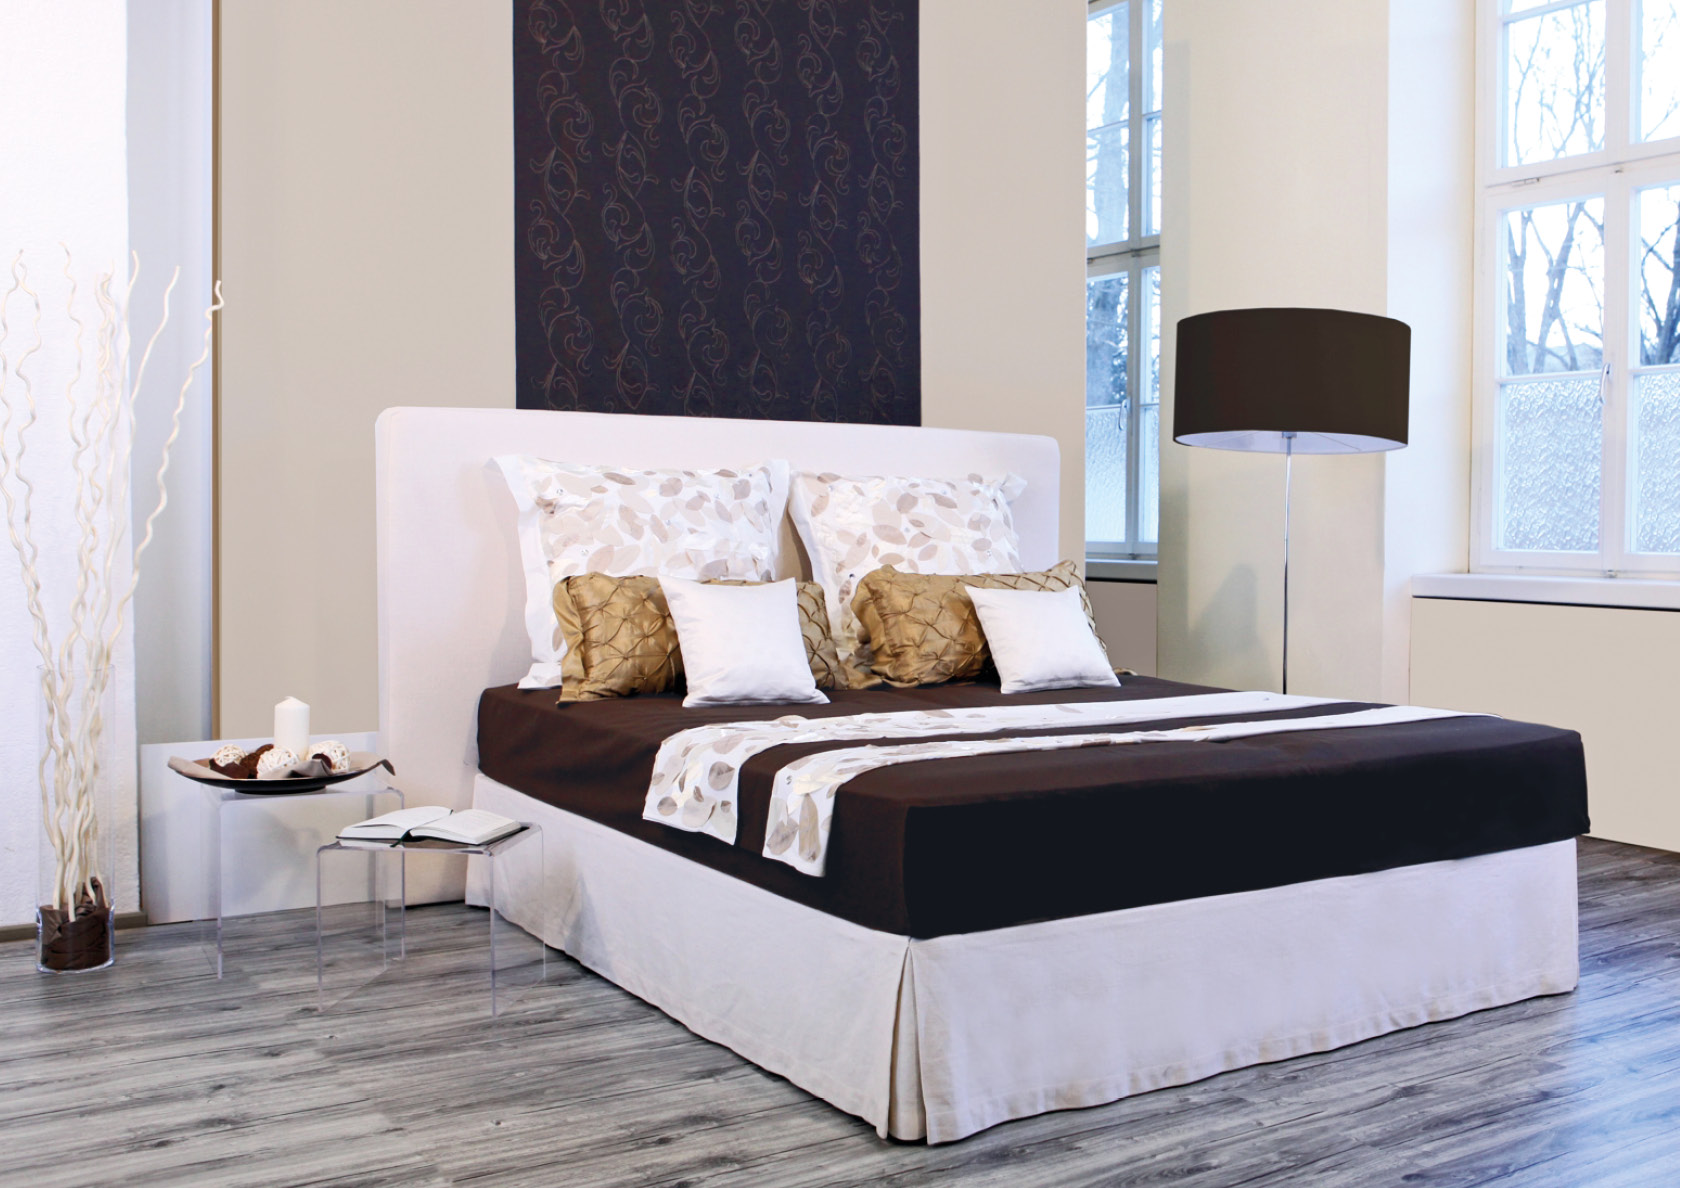 wasserbett pur dual betten u matratzenfachmarkt hartmut kunst gmbh in alzenau. Black Bedroom Furniture Sets. Home Design Ideas